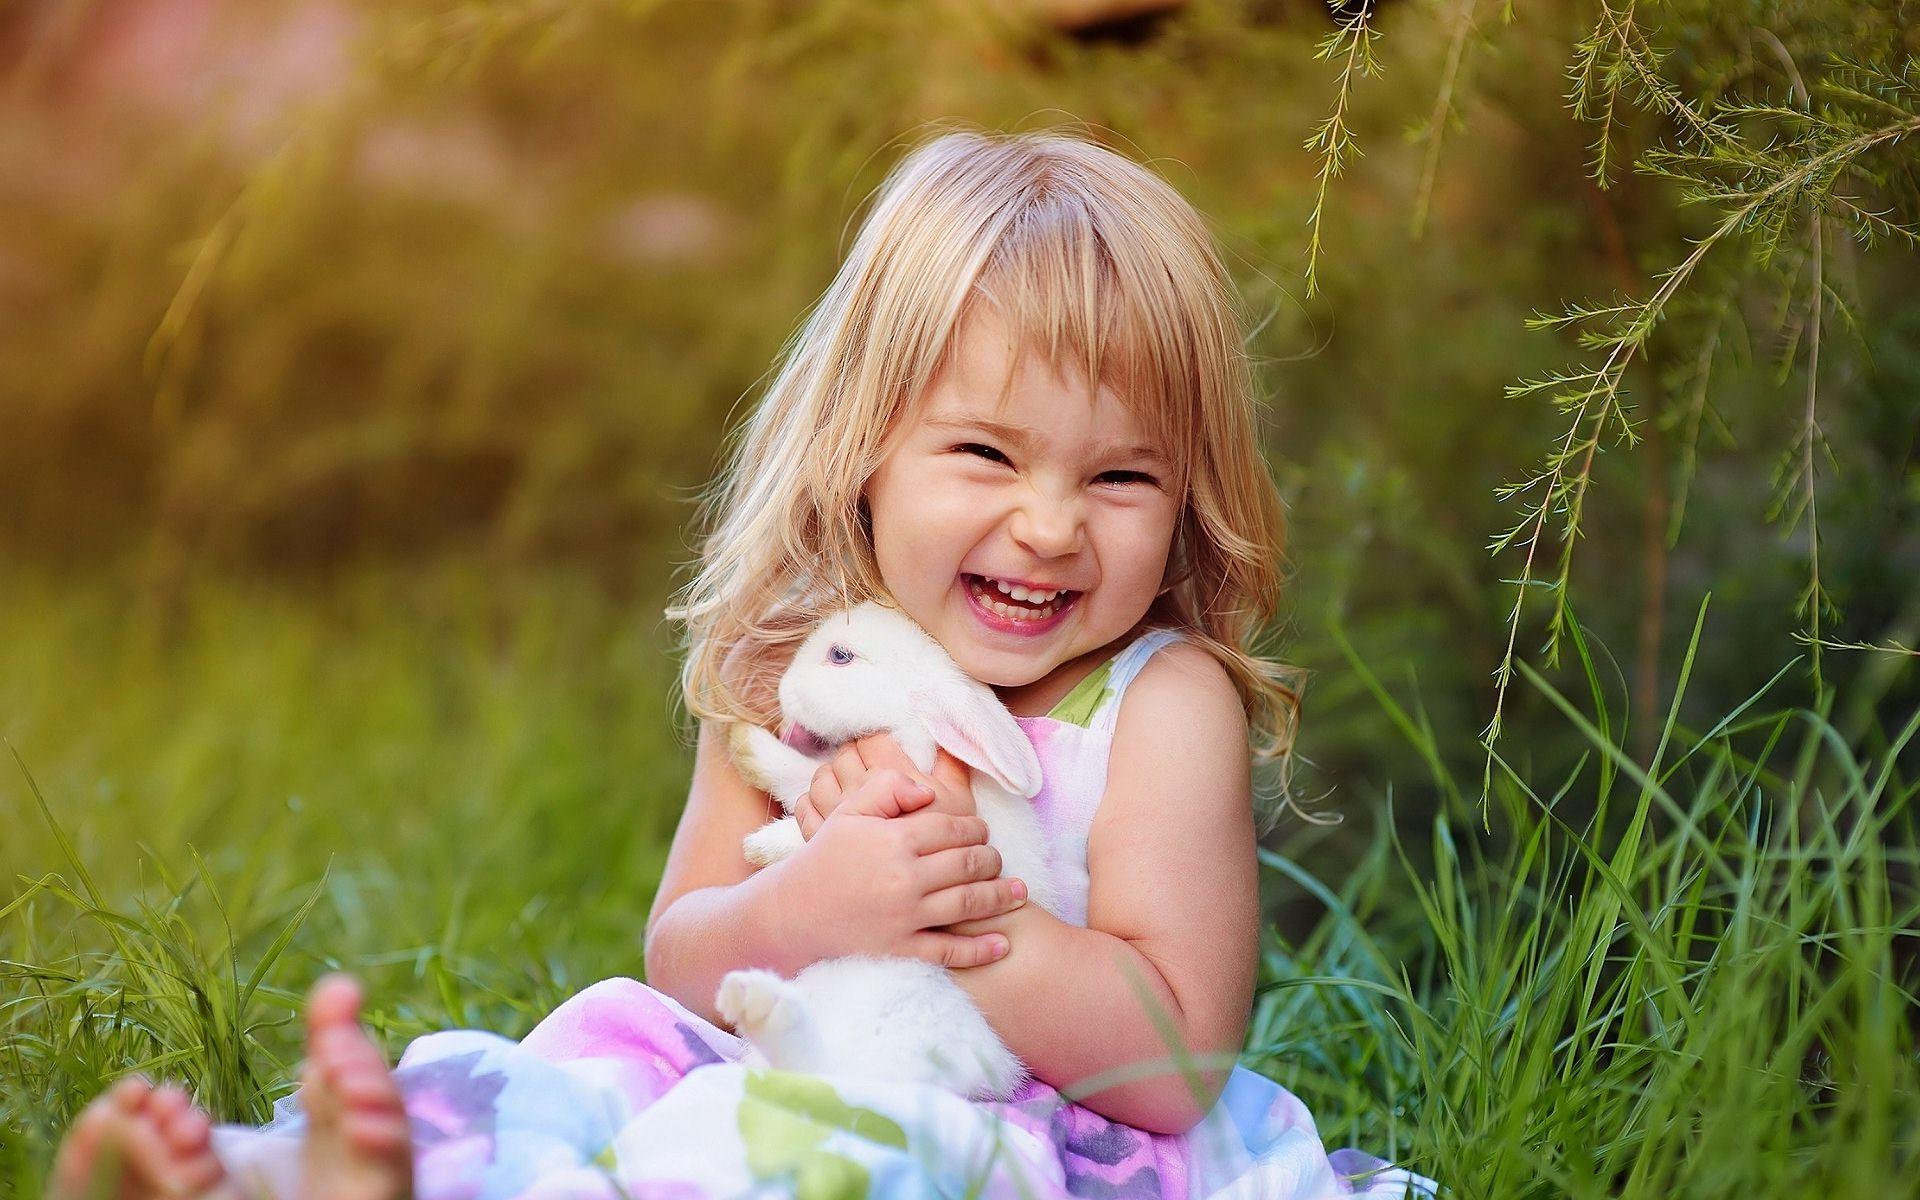 Cute Country Wallpaper Lovely Baby Girl Desktop Background Pixelstalk Net